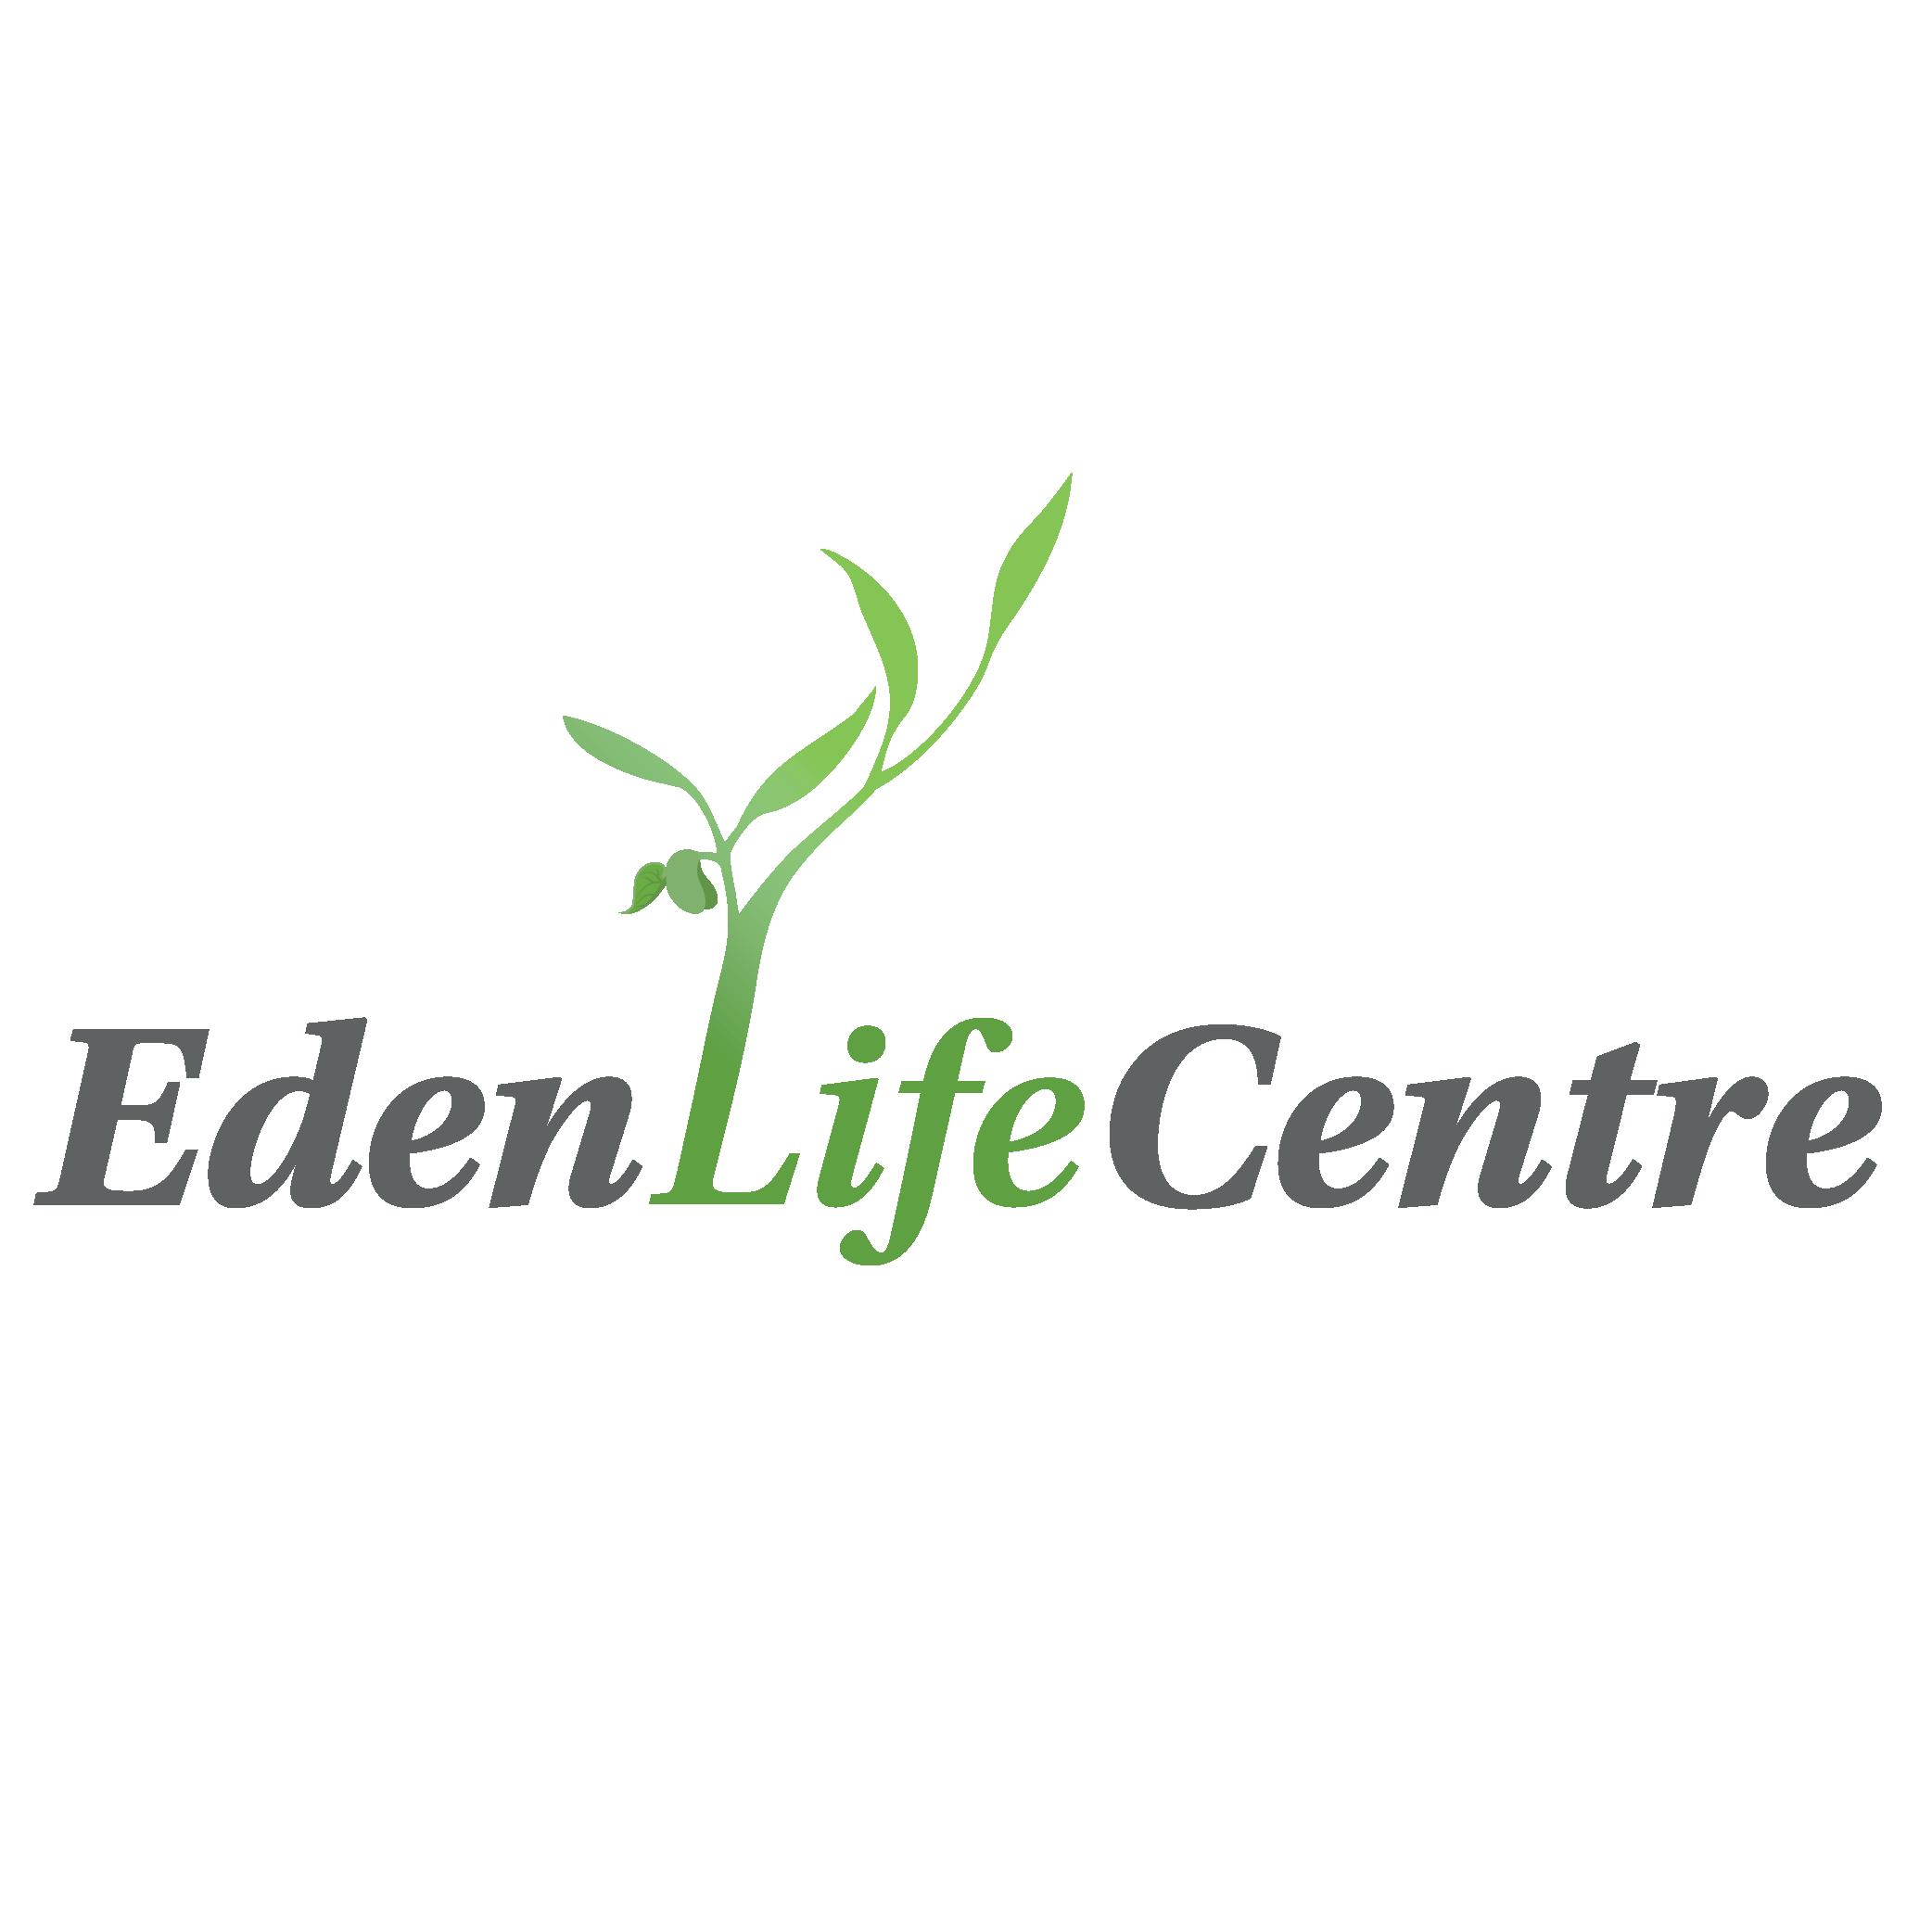 Eden Life Center